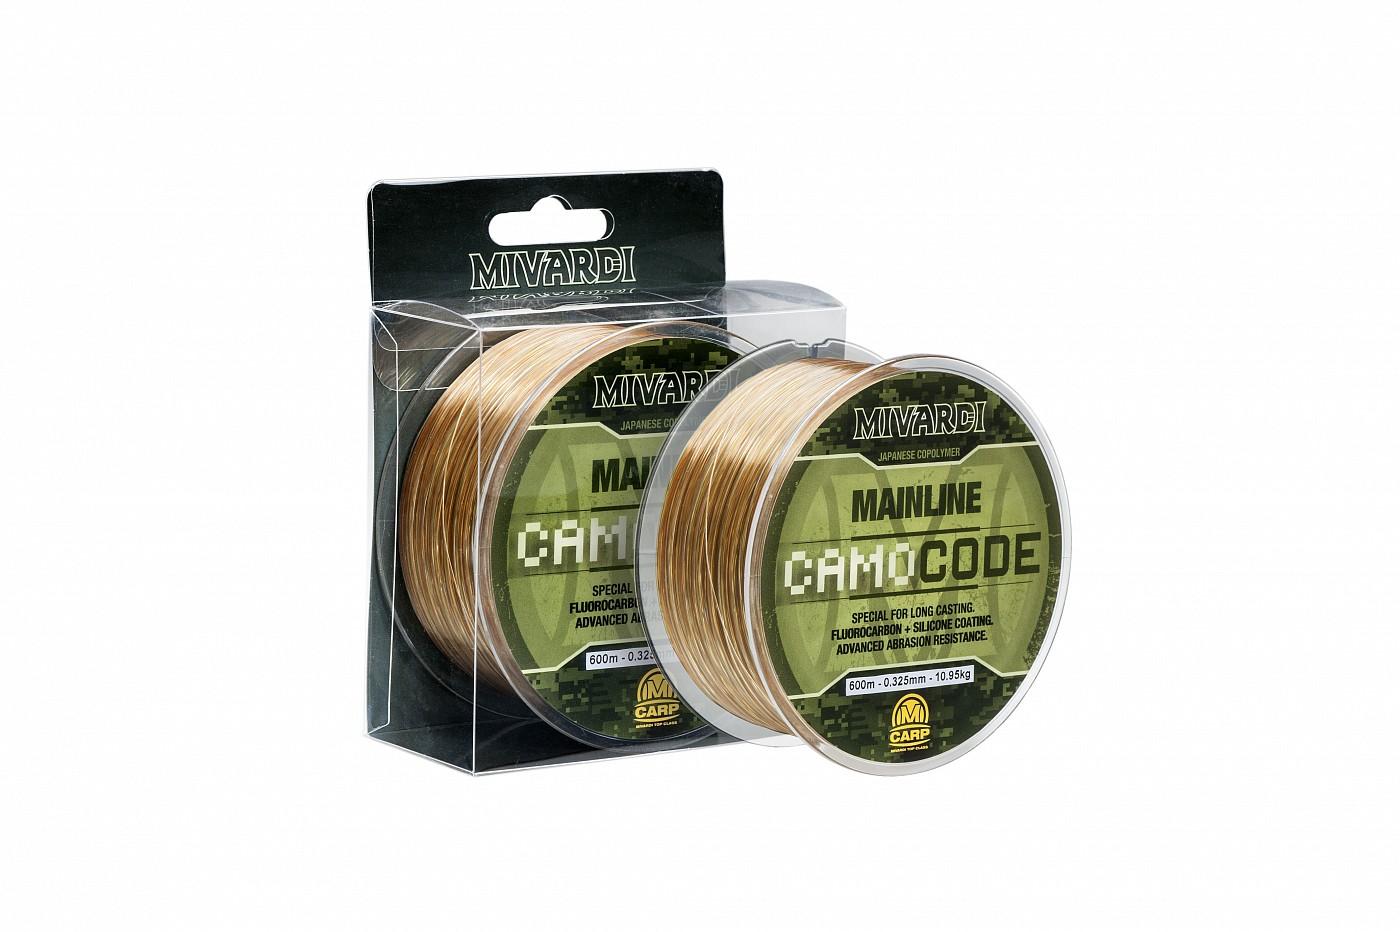 MIV-LCM12028 CamoCODE Mainline 0.285mm 1200m 1200m 0.285mm